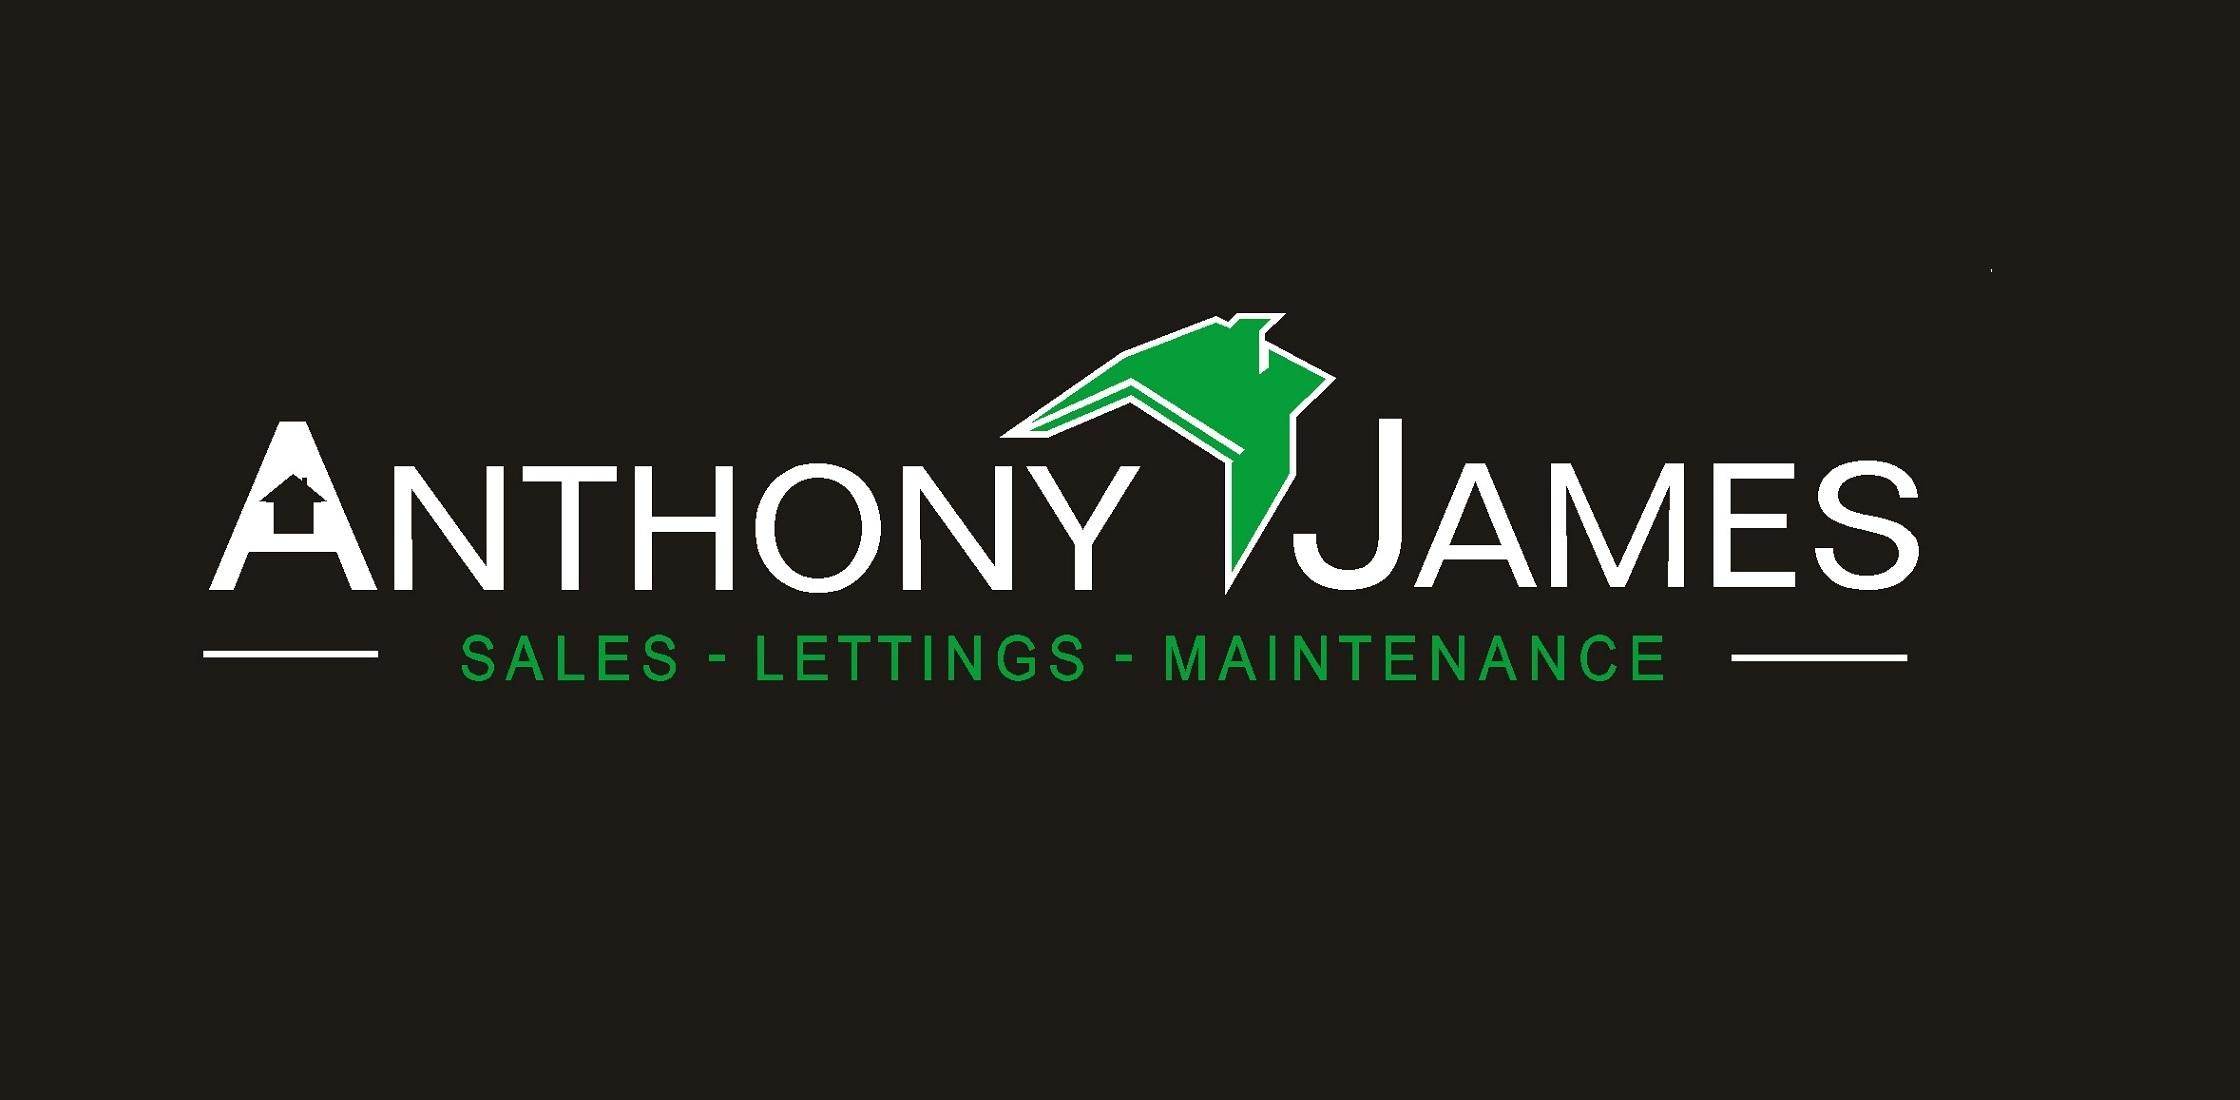 Anthony James Property